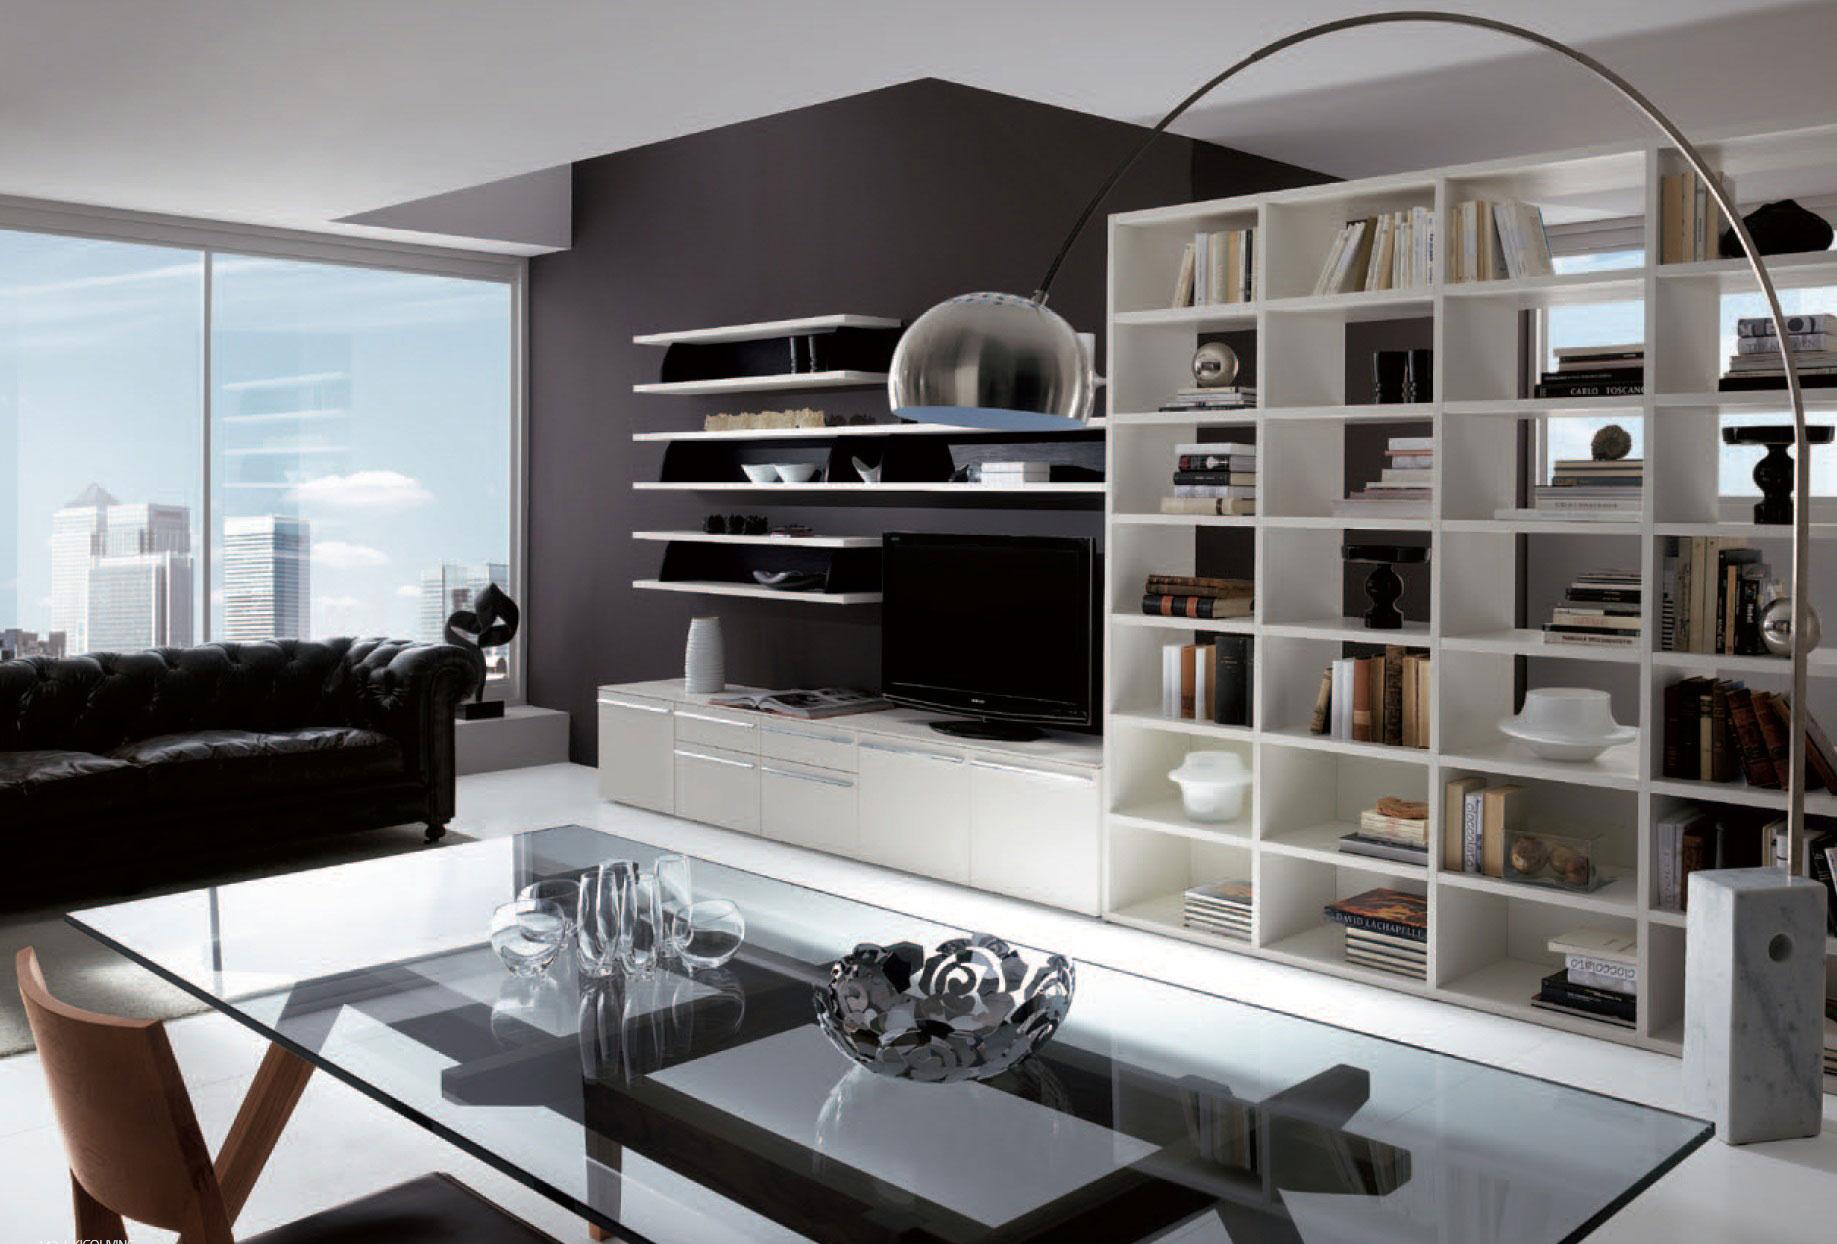 meubles design italien discount maison design. Black Bedroom Furniture Sets. Home Design Ideas